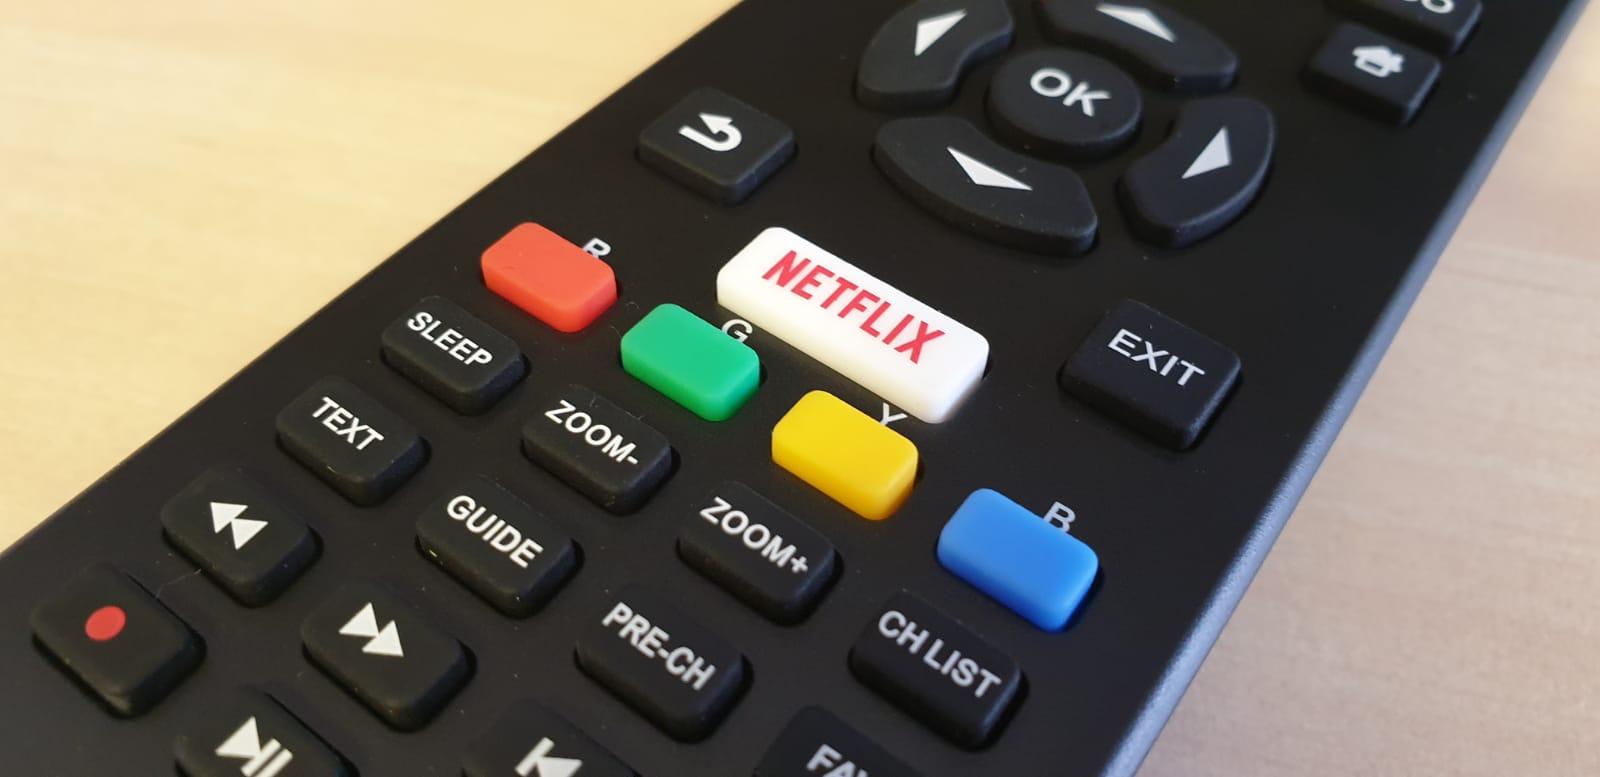 buton dedicat pentru netflix